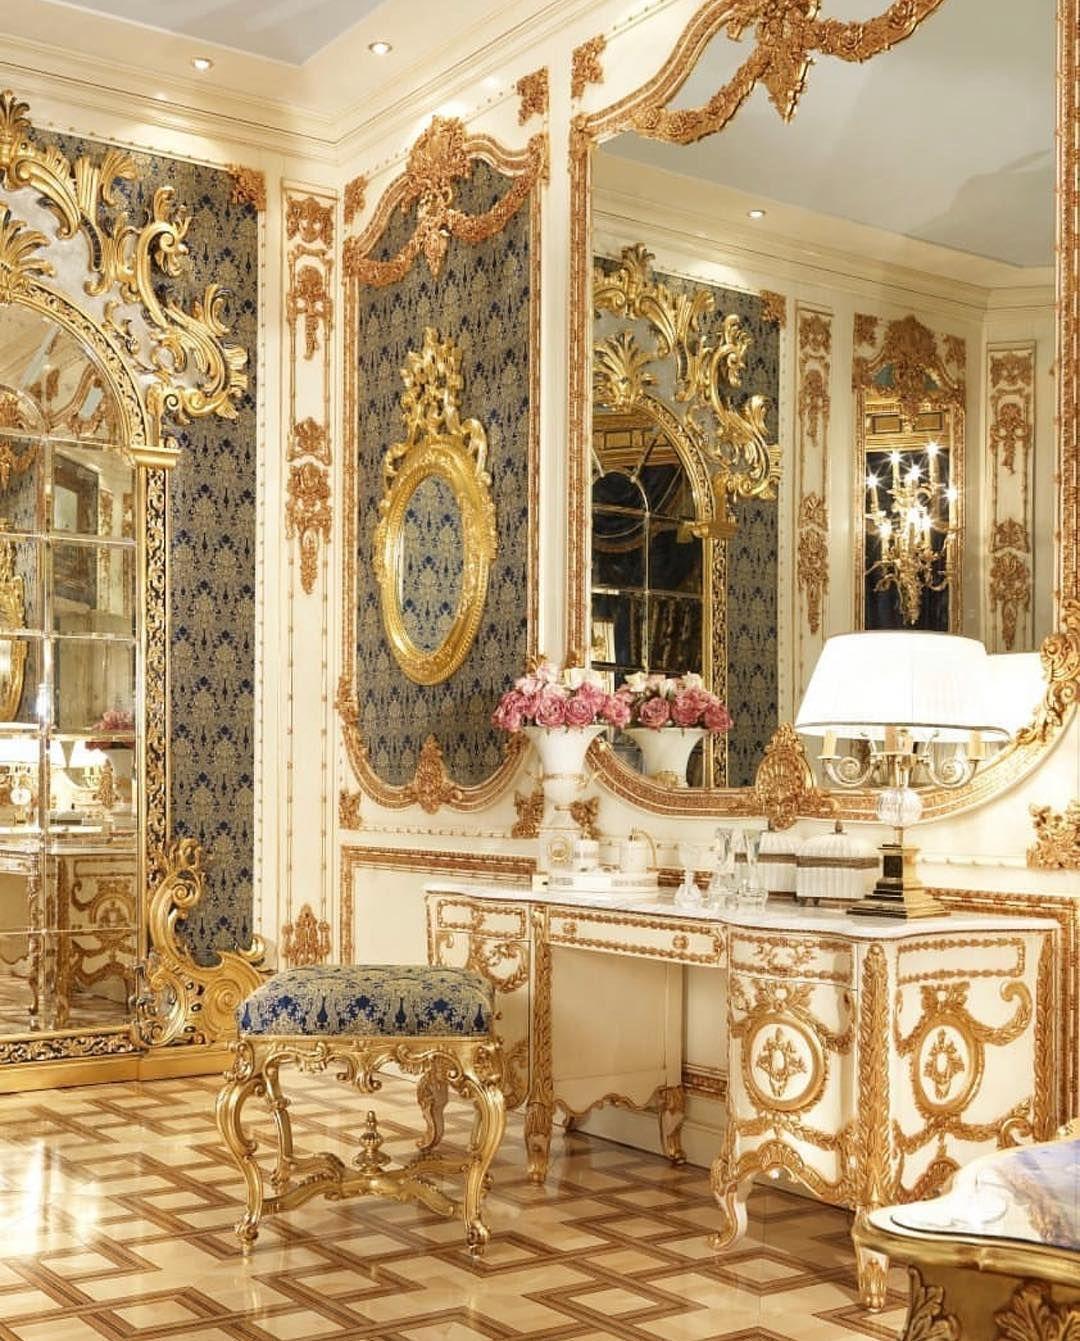 Italian Furniture Online On Instagram Italianfurnitureonline Riyadh Kazakhstan N Luxury Bedroom Design Best Home Interior Design Luxury Italian Furniture